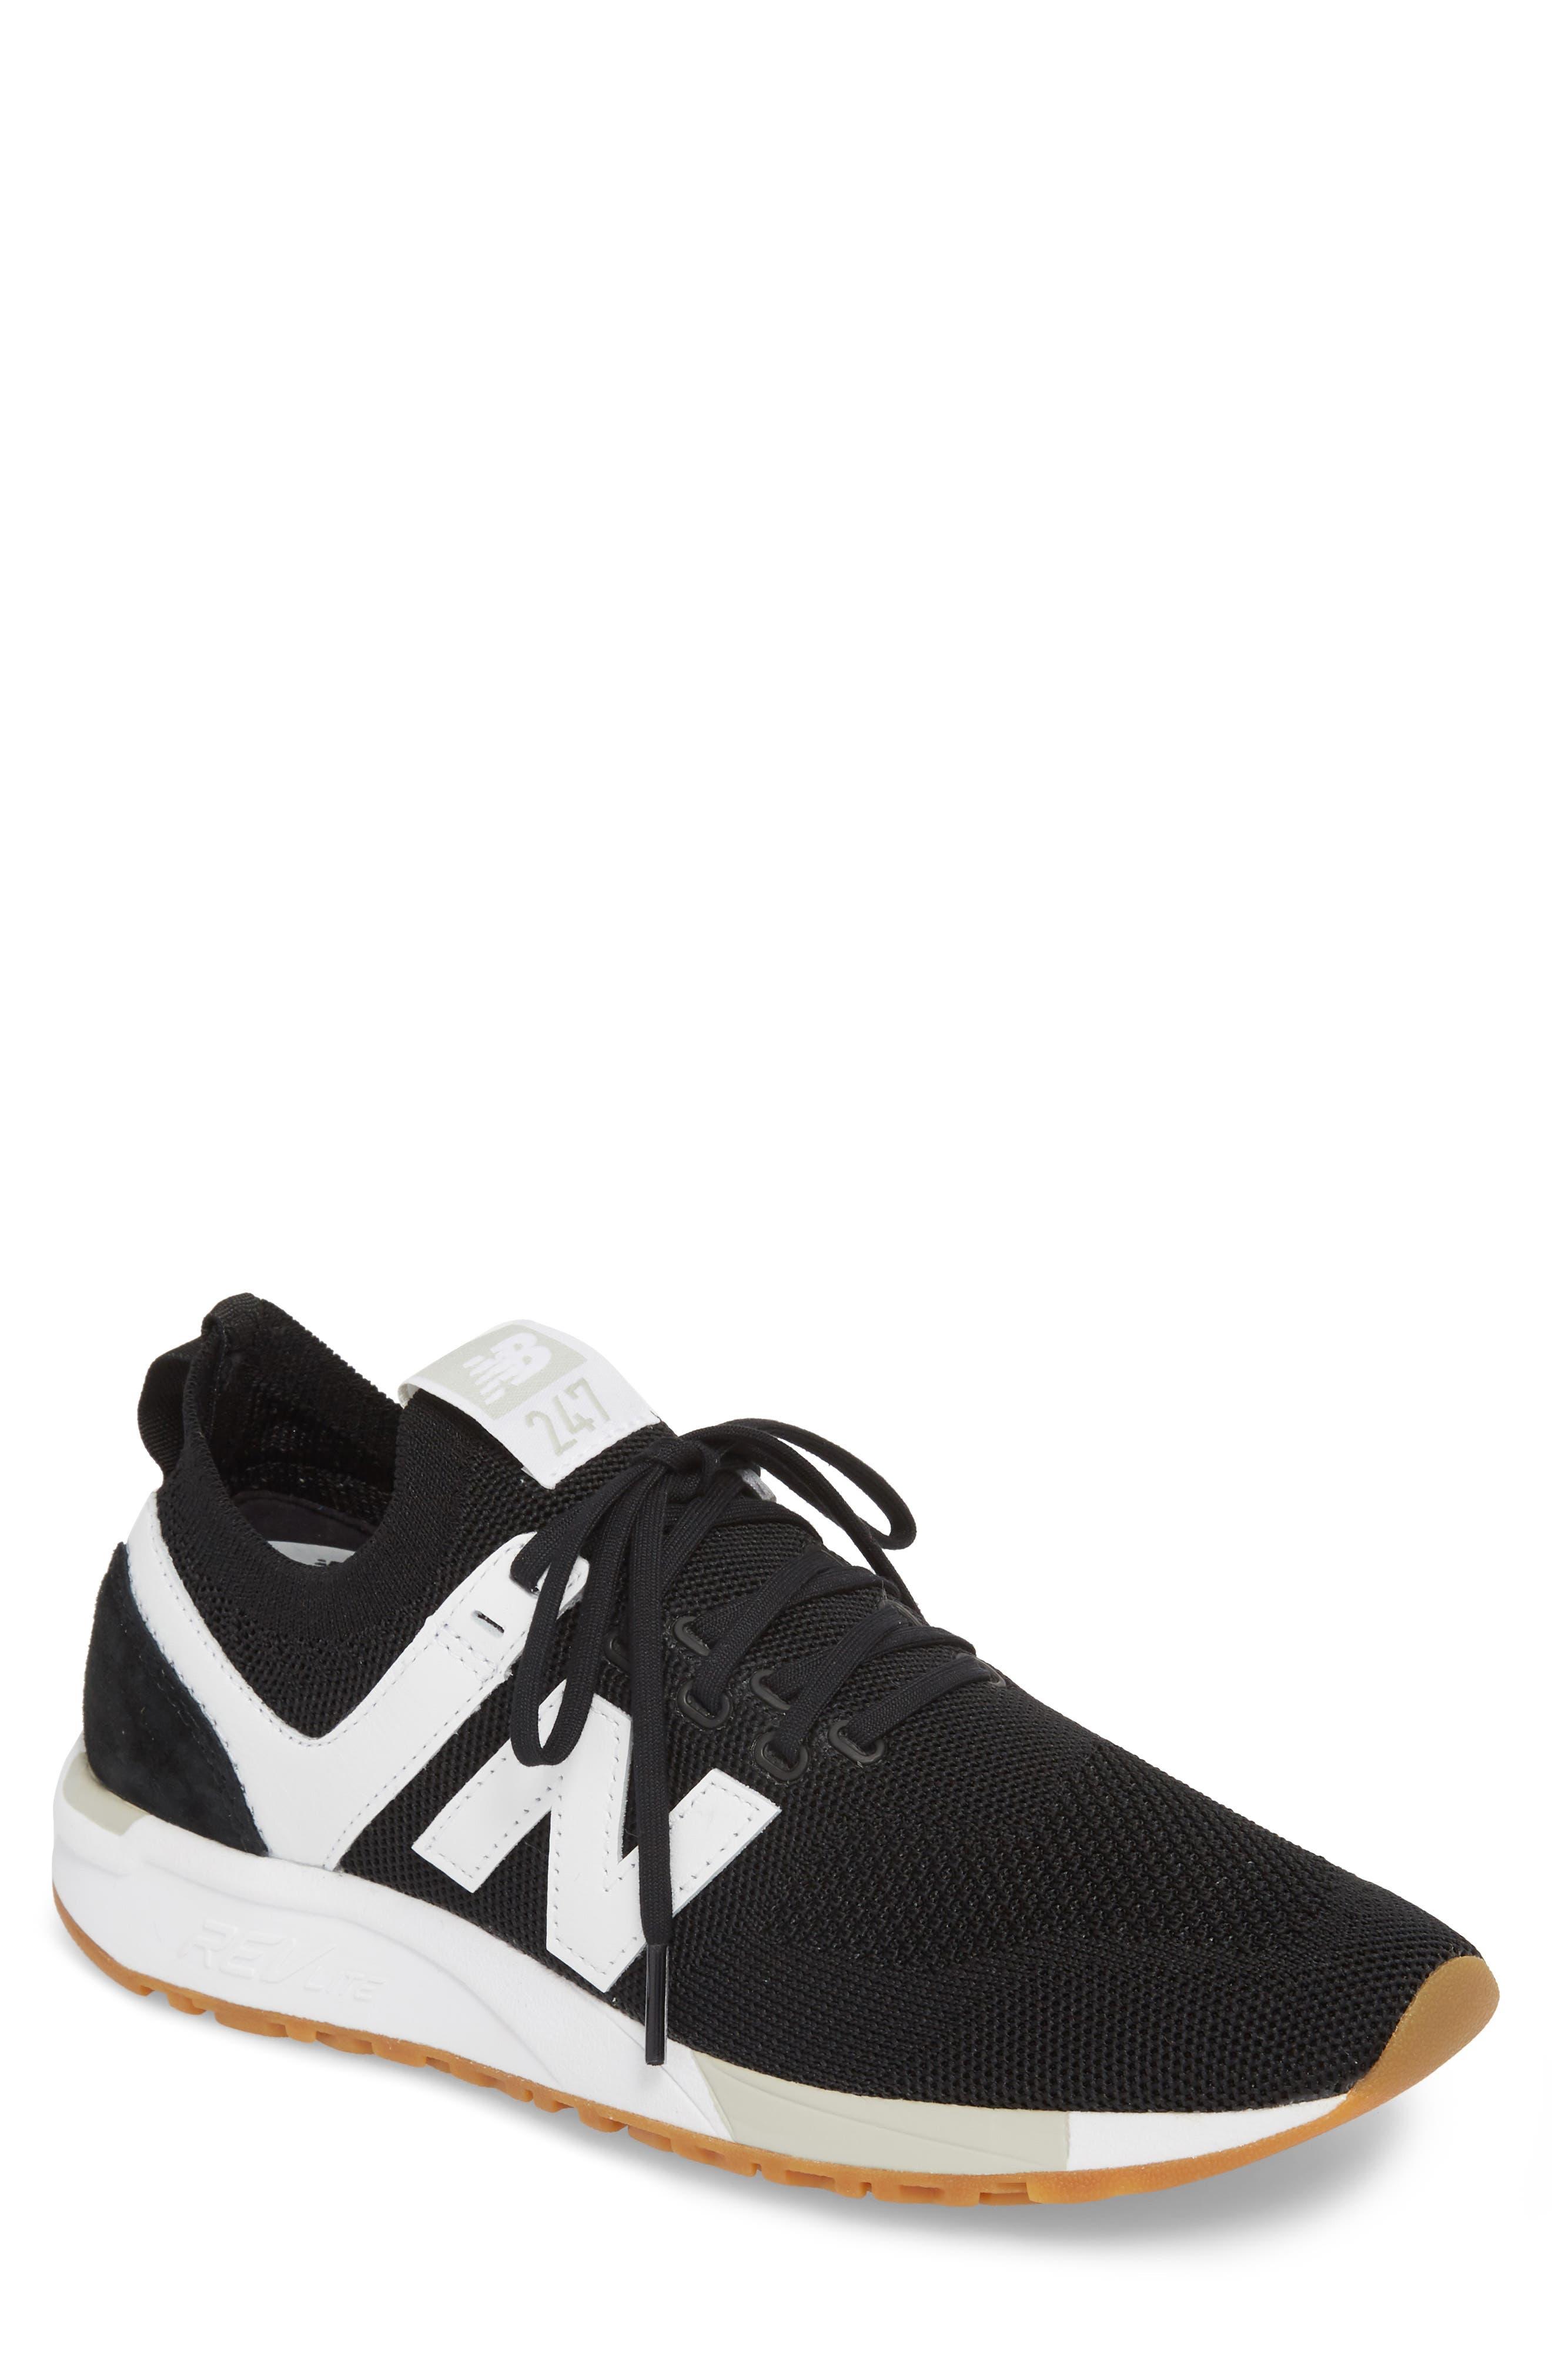 247 Decon Sneaker,                         Main,                         color, 001